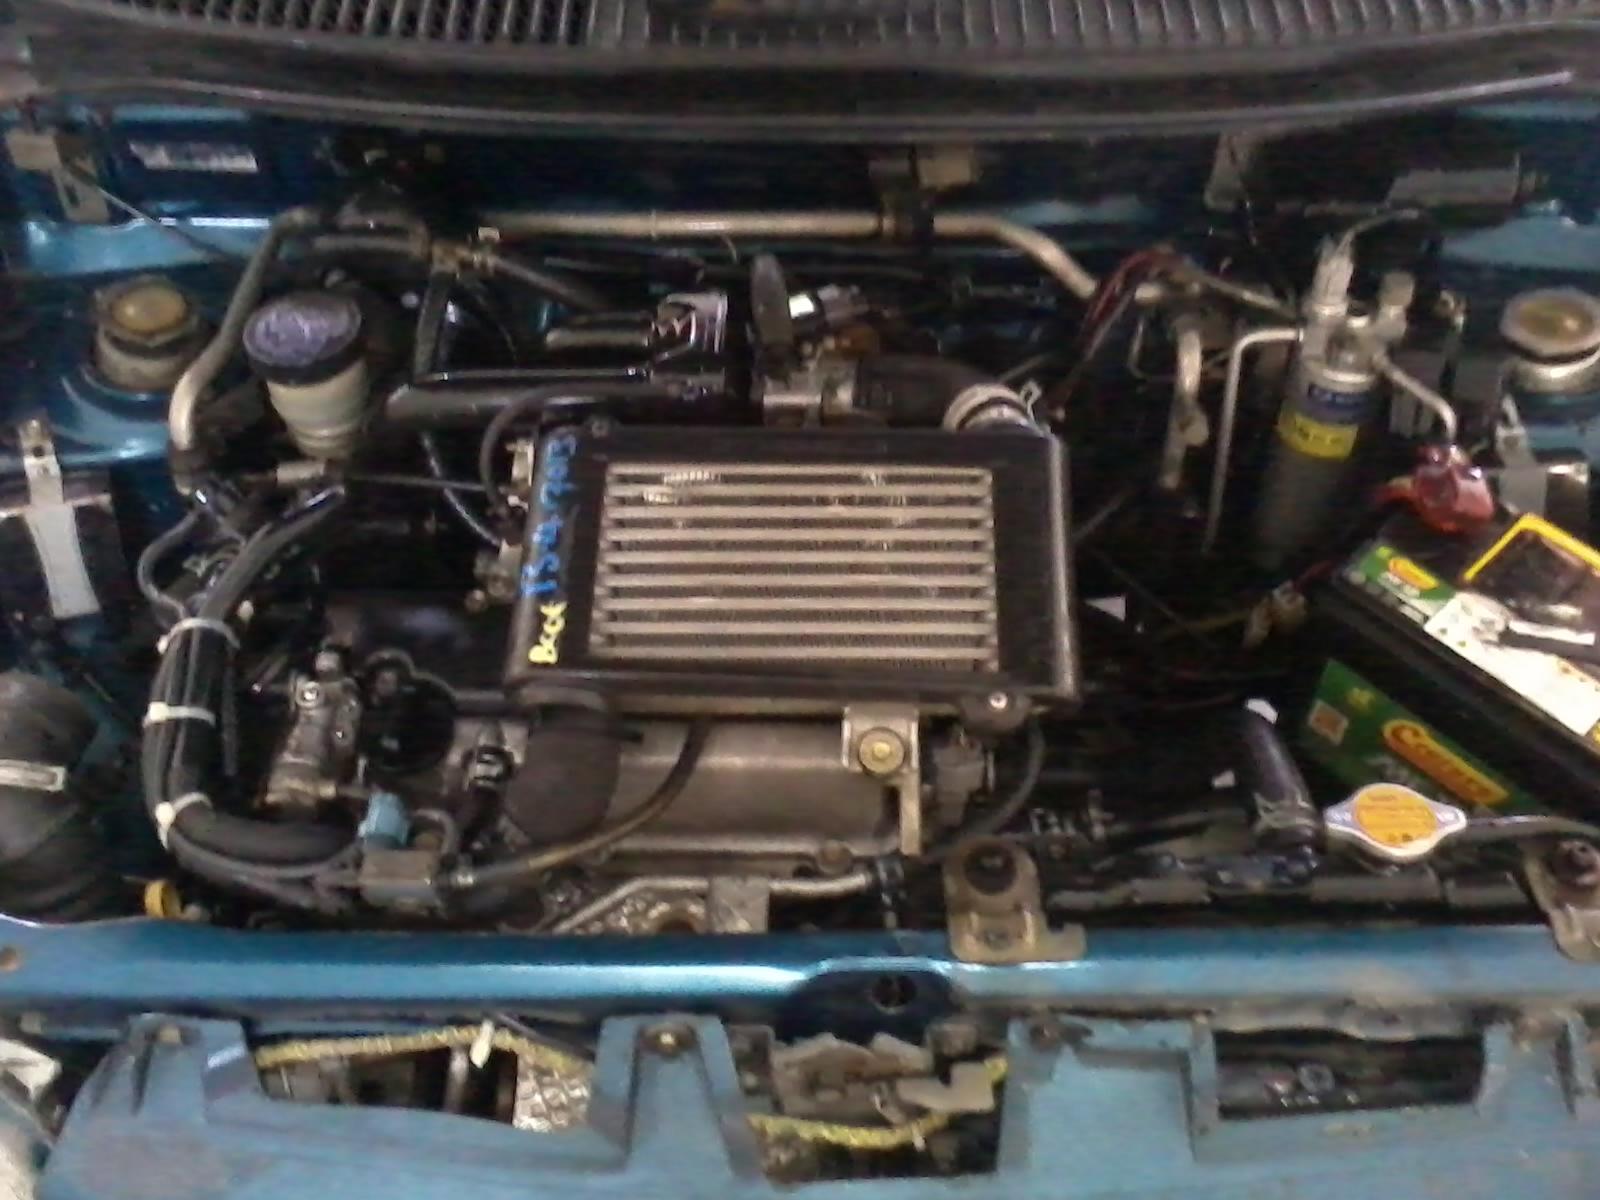 Daihatsu Mira L7 Wiring Diagram Product Diagrams Move Cool Perodua Kancil Engine Photos Best Image 2017 Hijet